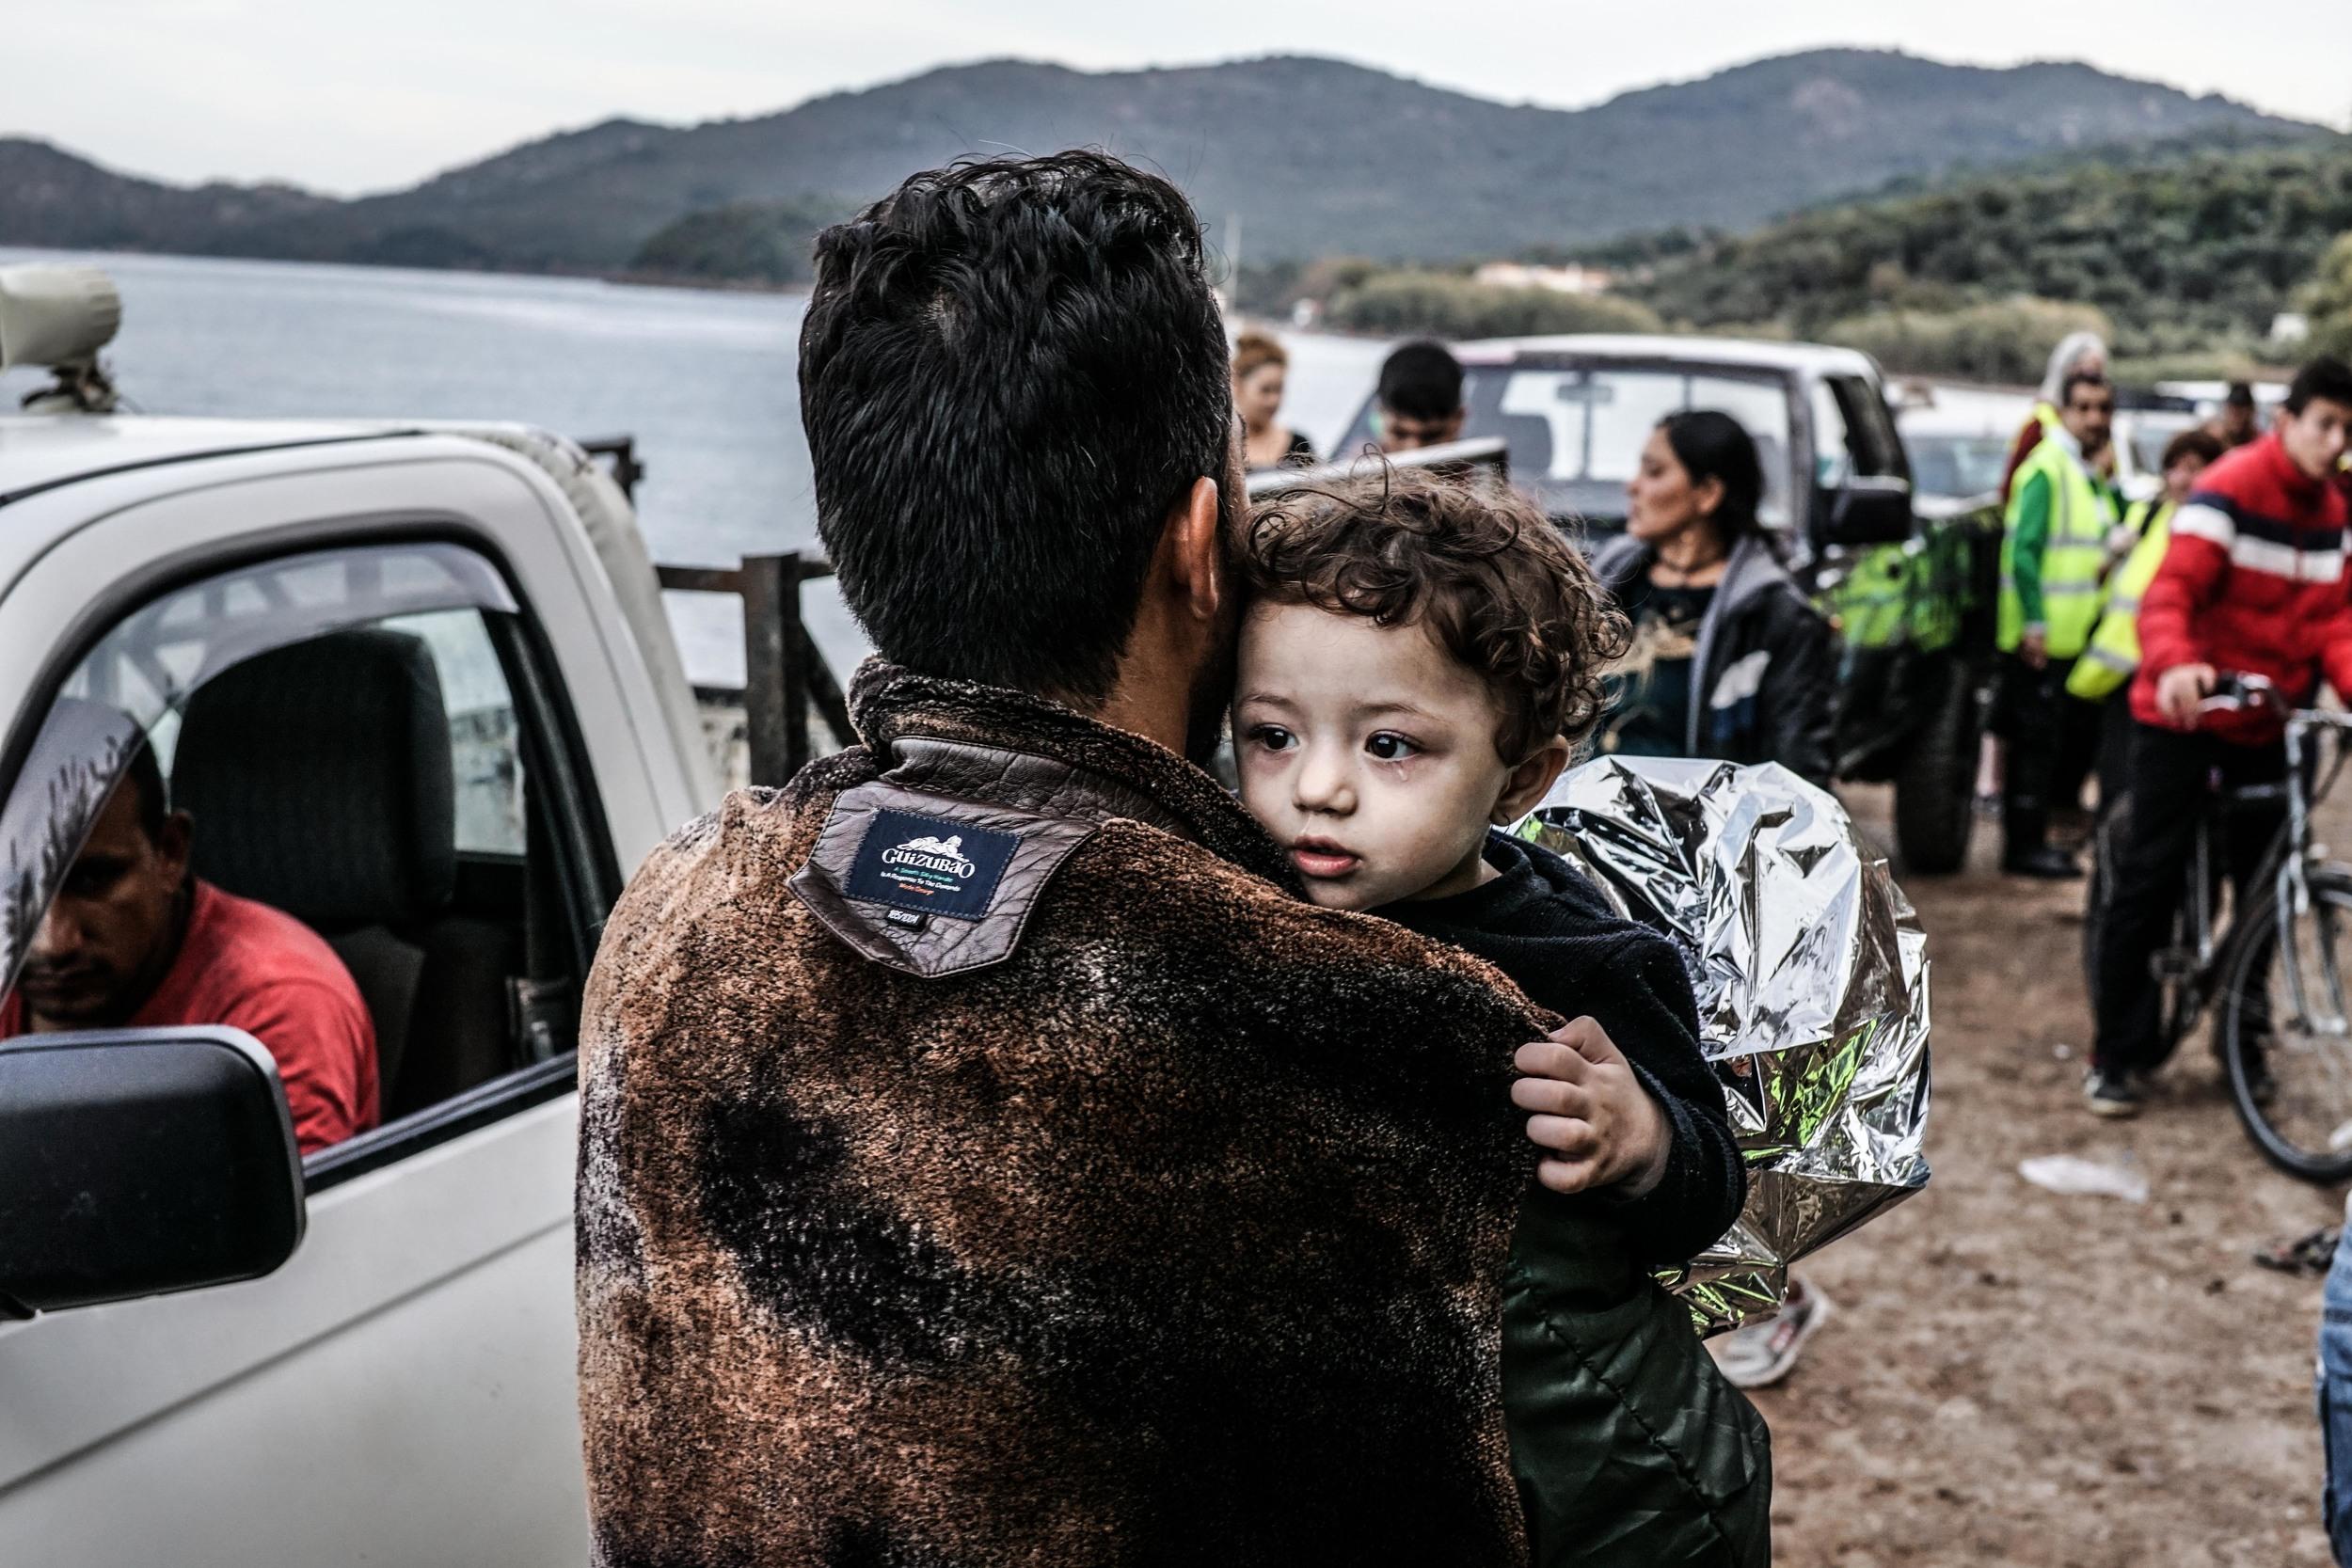 Syrian Refugee Crisis Lesbos Greece November 2015 26.jpg